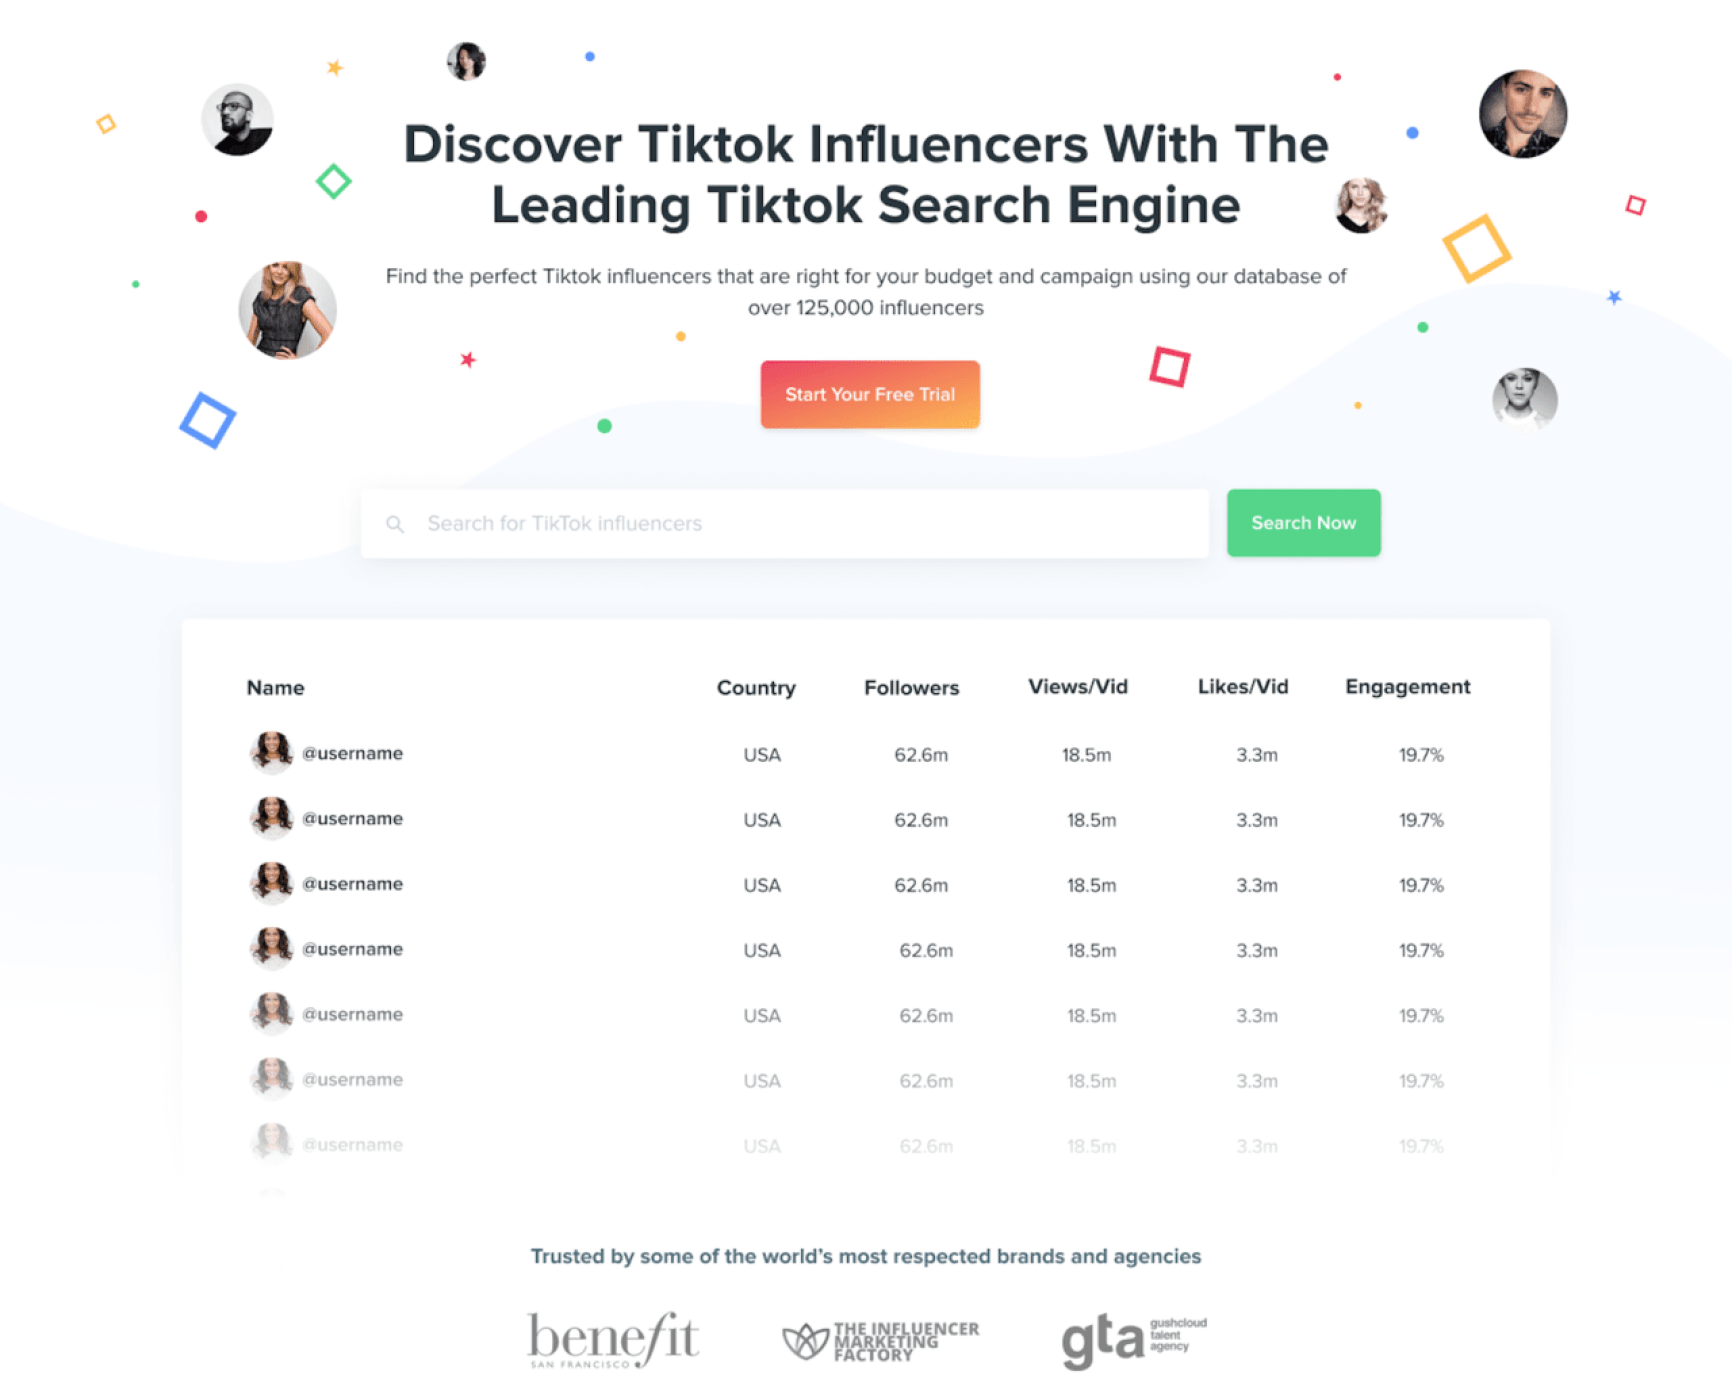 tiktok marketing influencer marketing influencer search